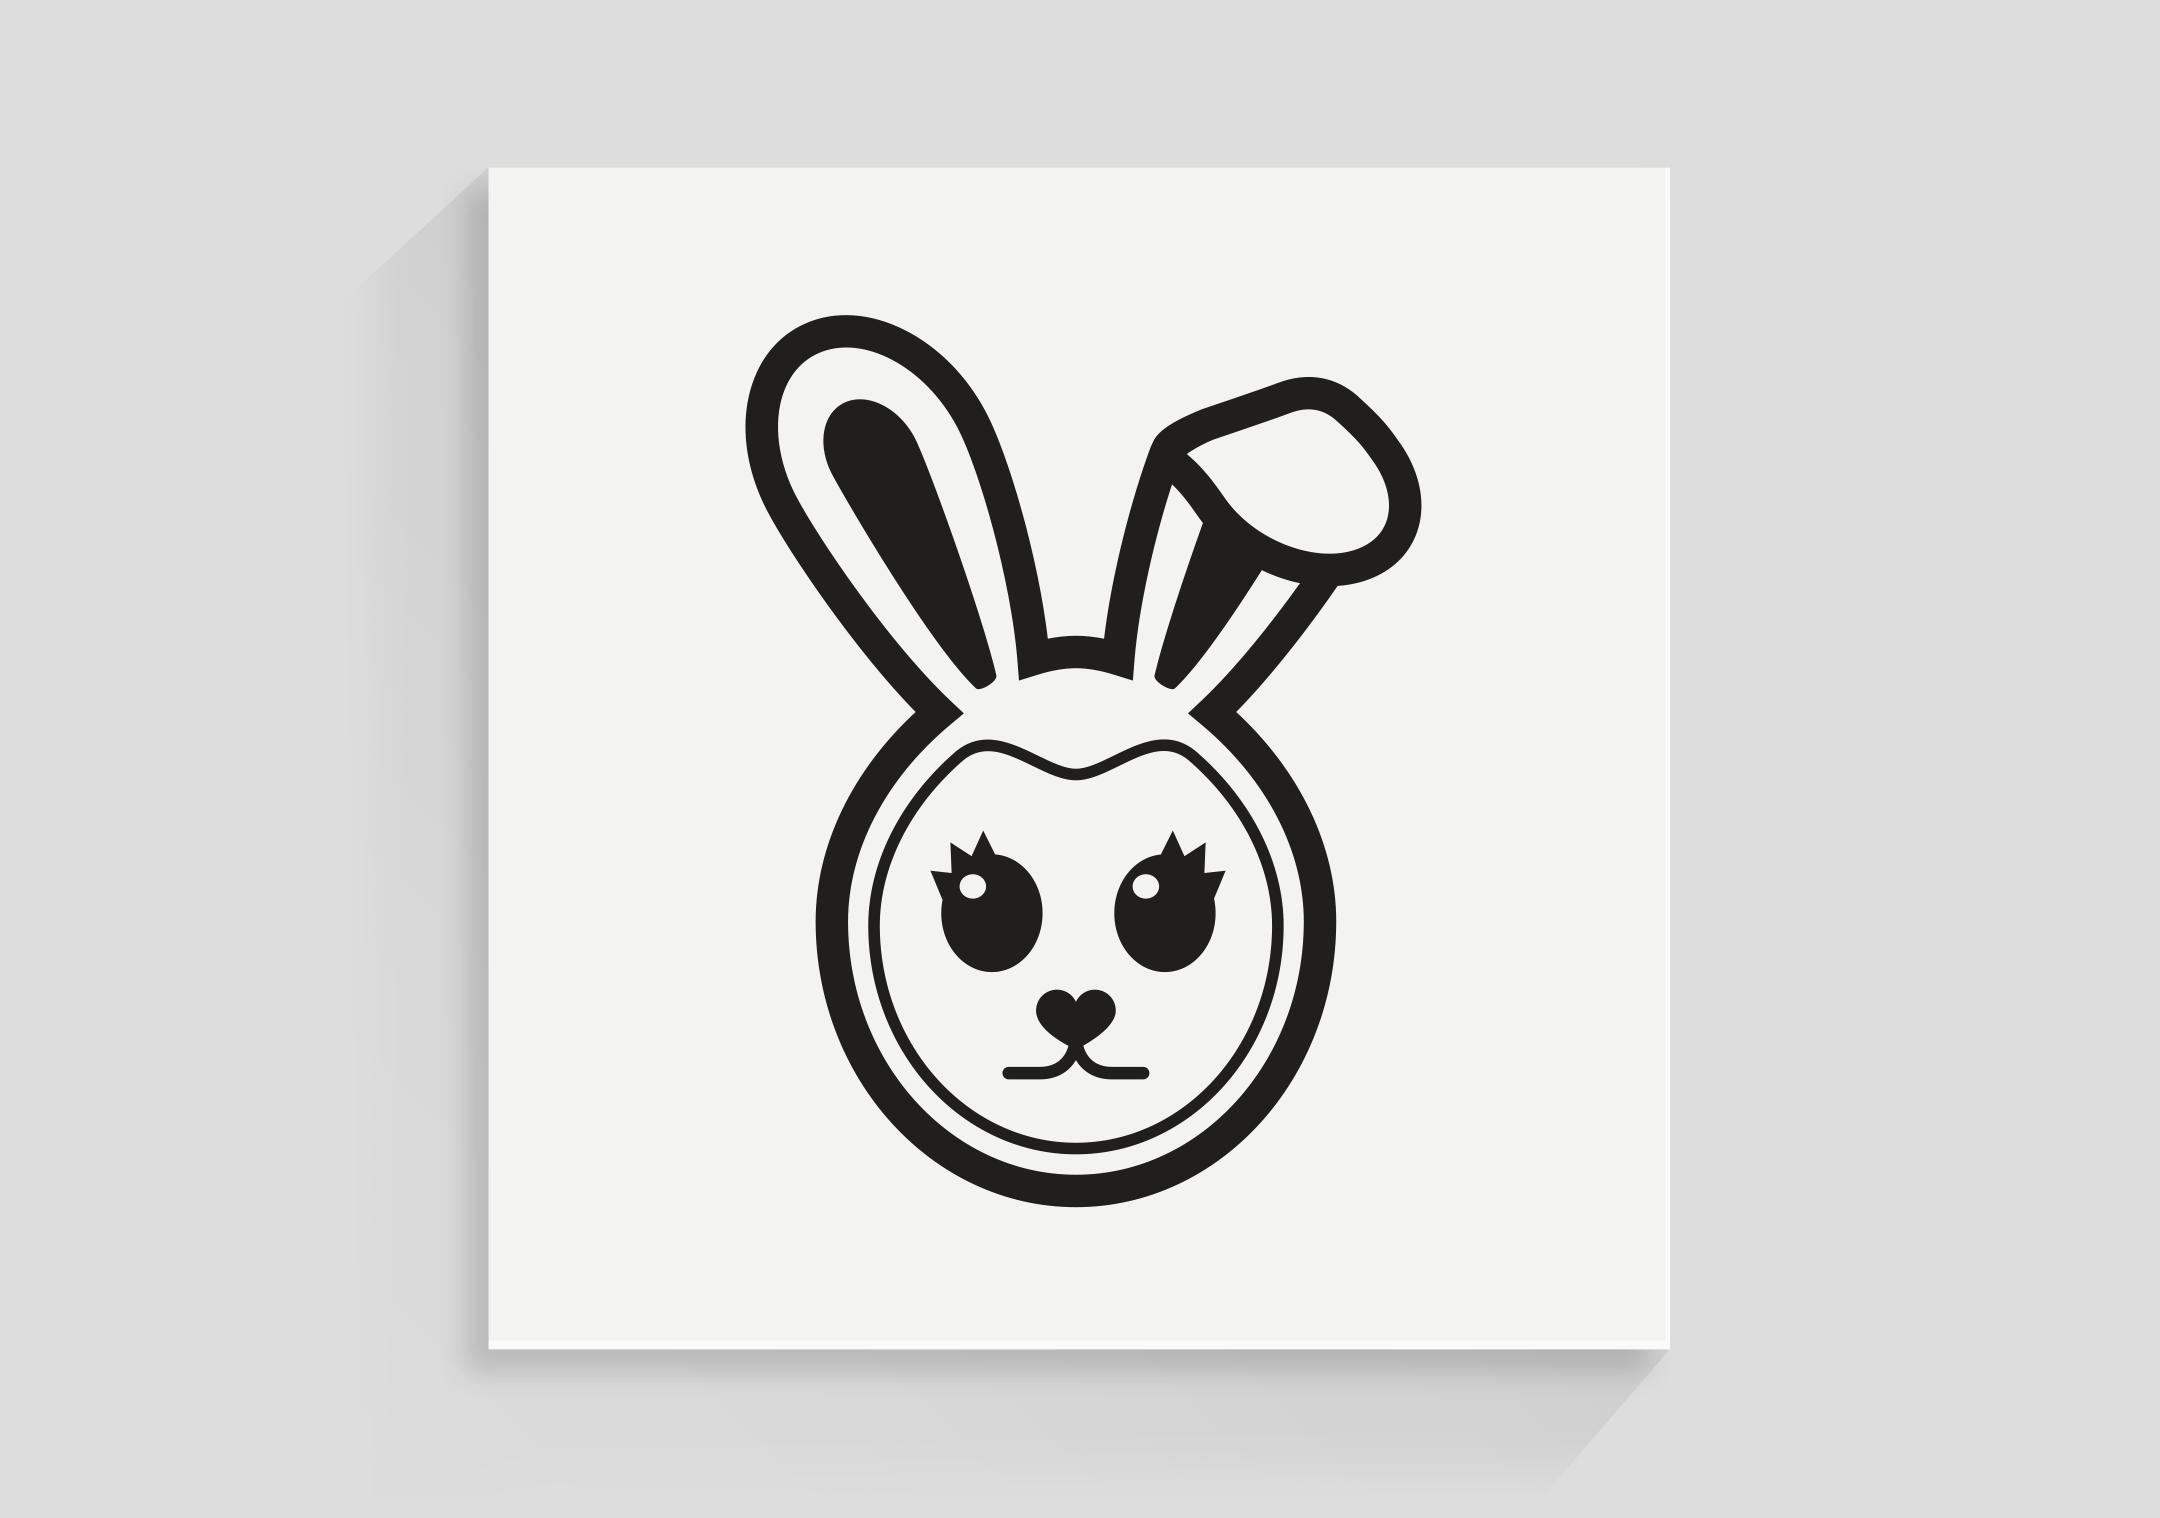 perplexed_bunny_1